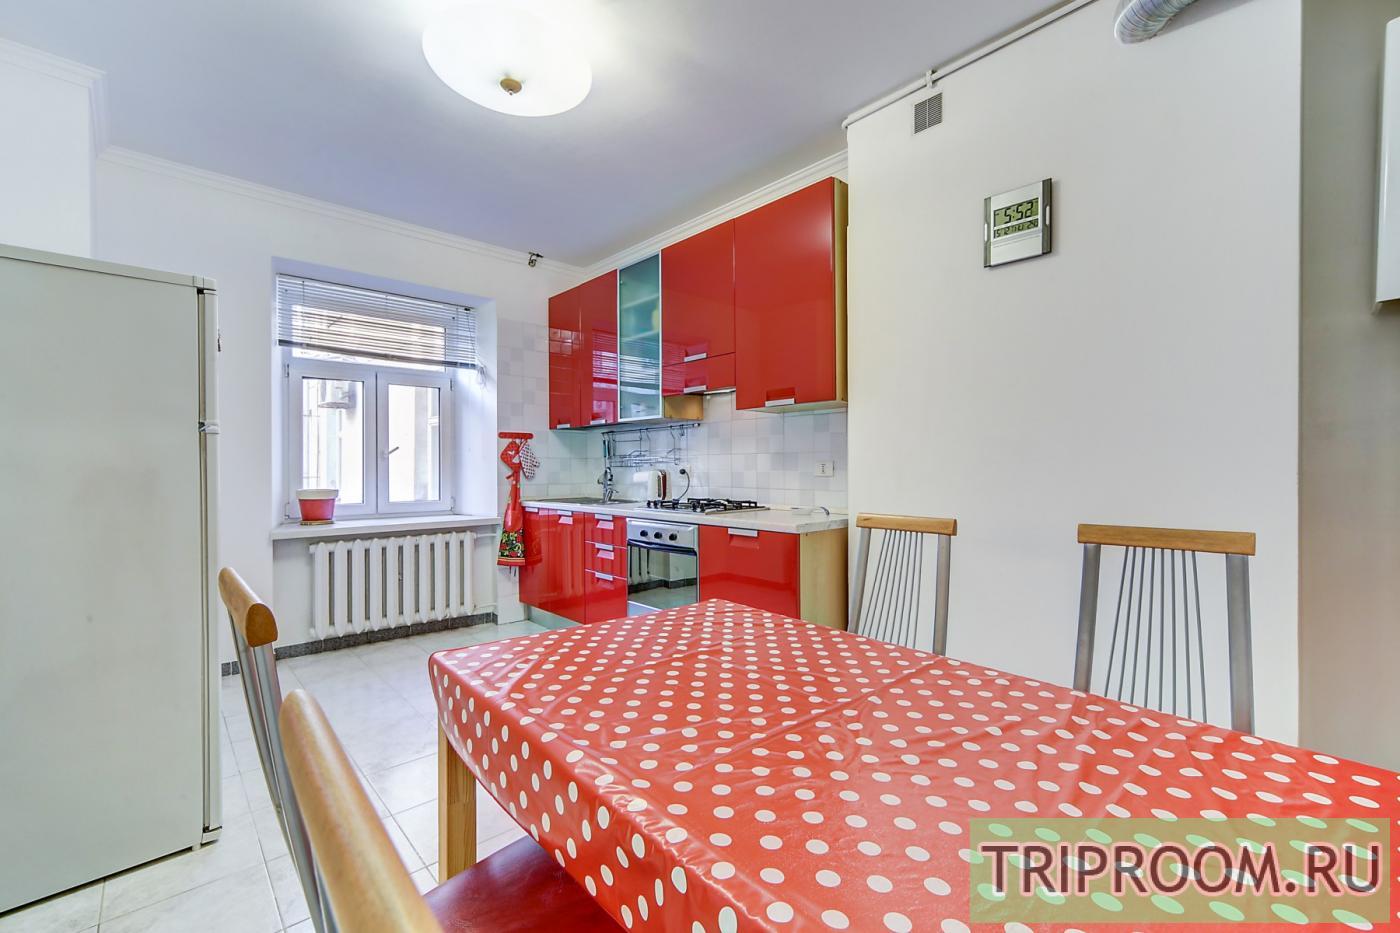 2-комнатная квартира посуточно (вариант № 20143), ул. Невский проспект, фото № 6